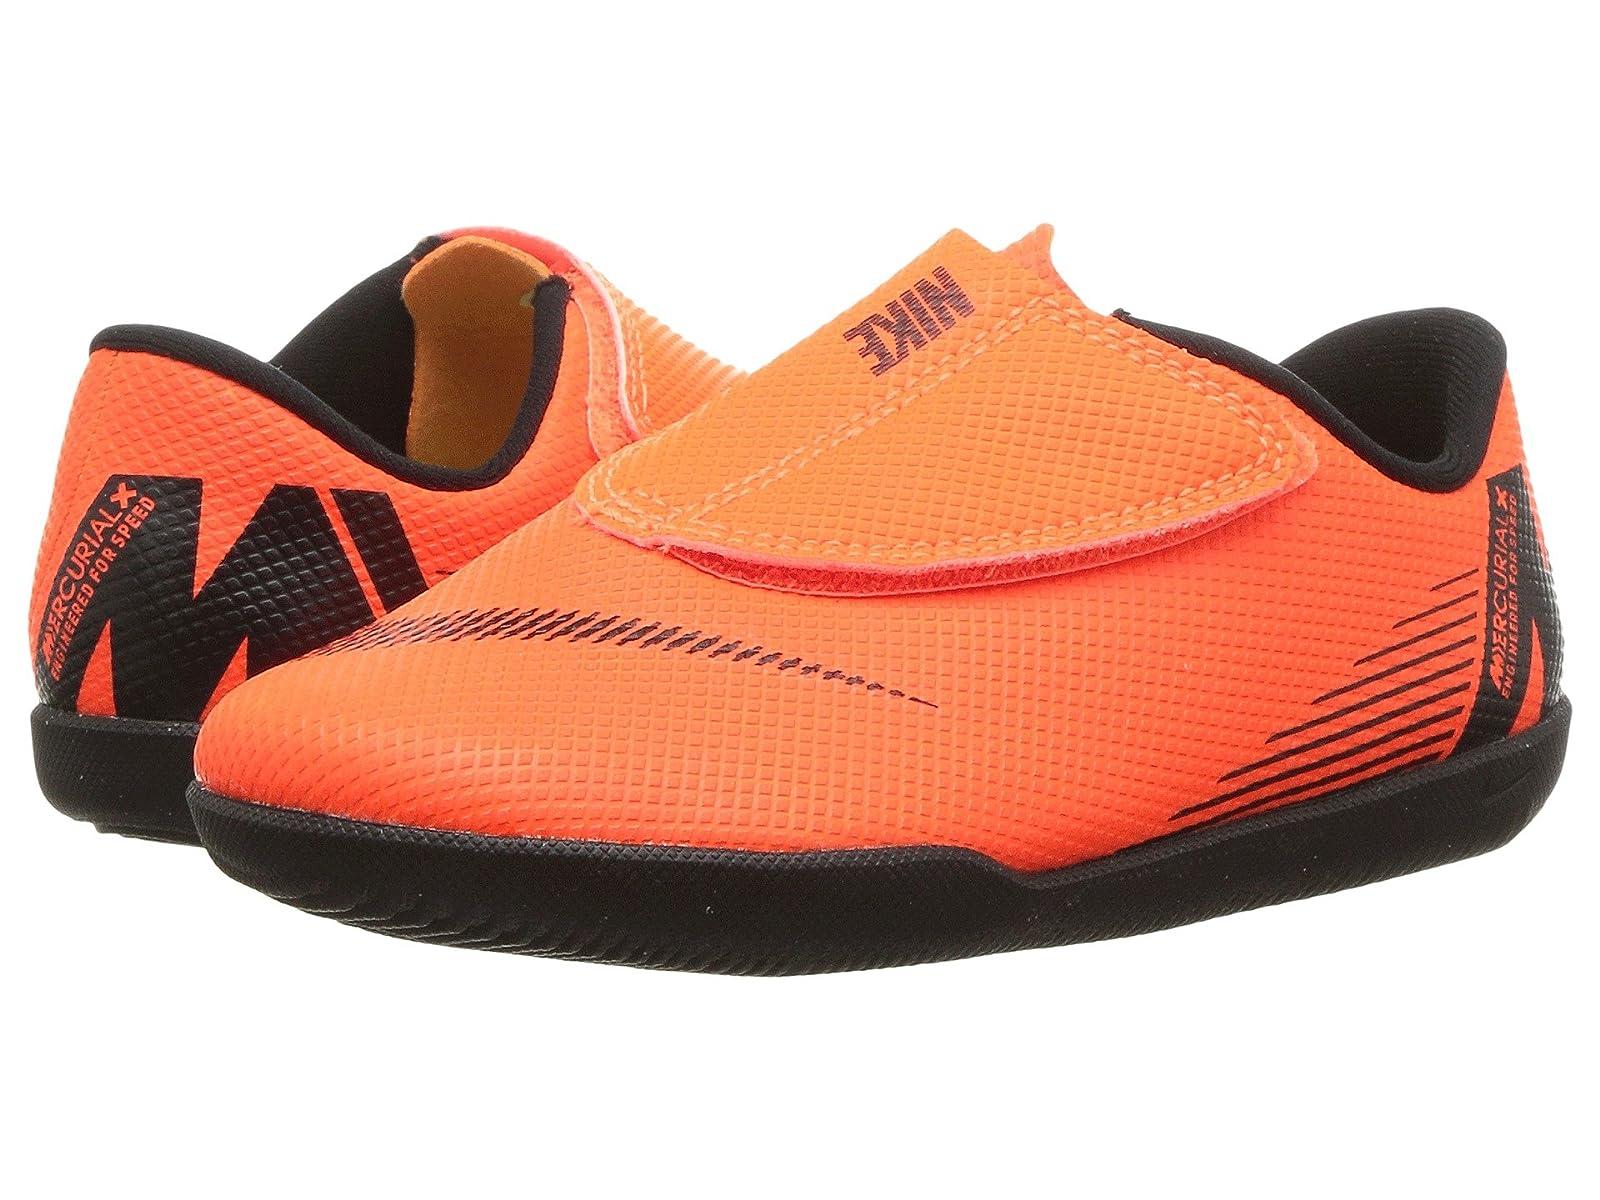 Nike Kids VaporX 12 Club IC Soccer (Toddler/Little Kid)Atmospheric grades have affordable shoes